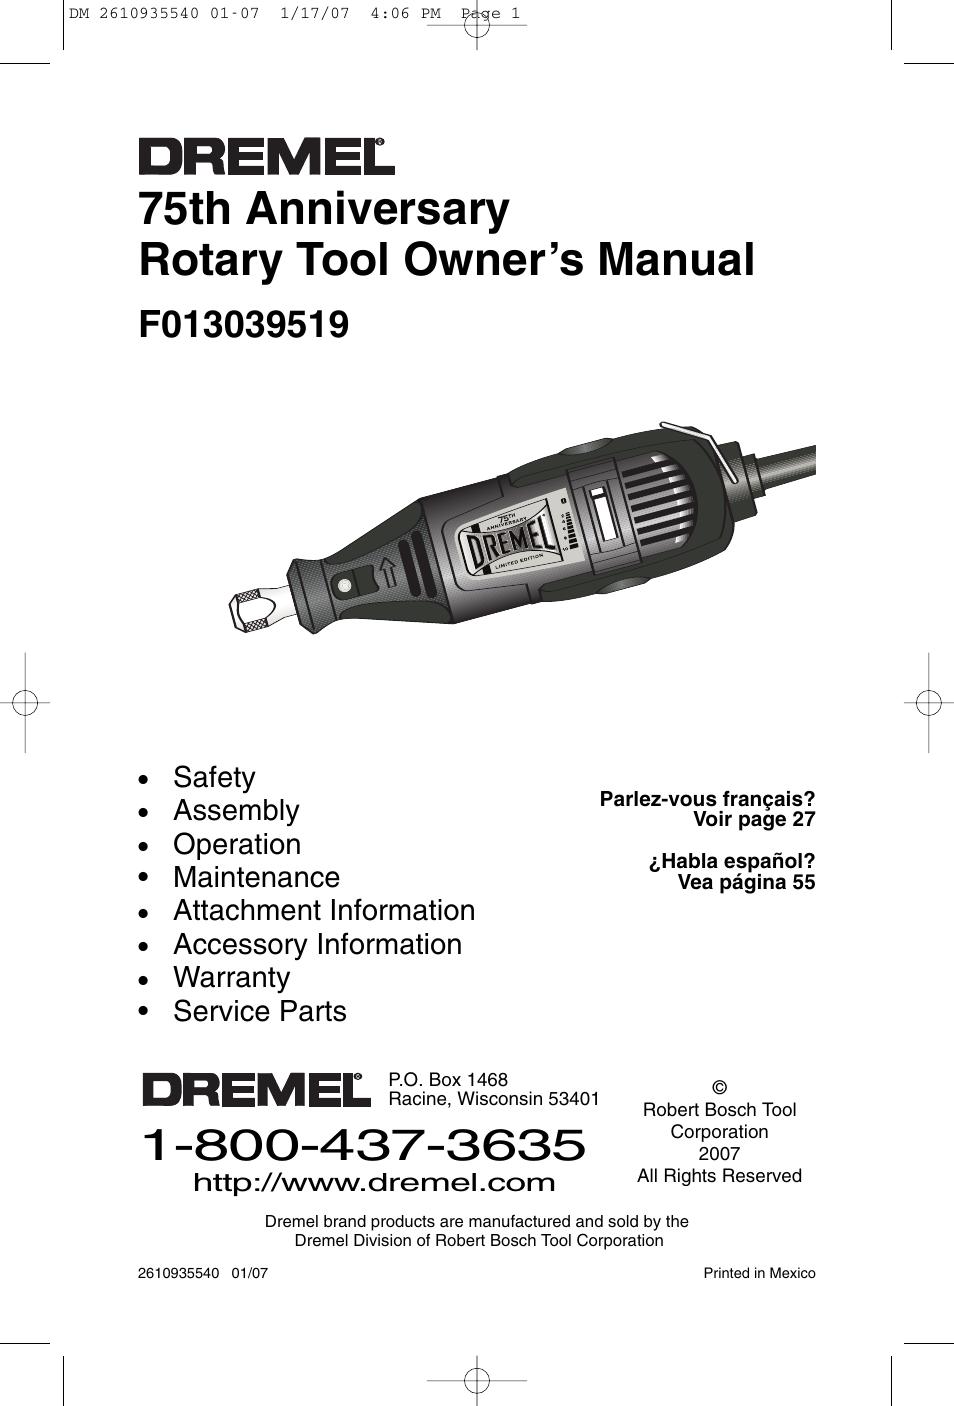 dremel f013039519 user manual 88 pages rh manualsdir com manual for dremel slicing software manual for dremel slicing software